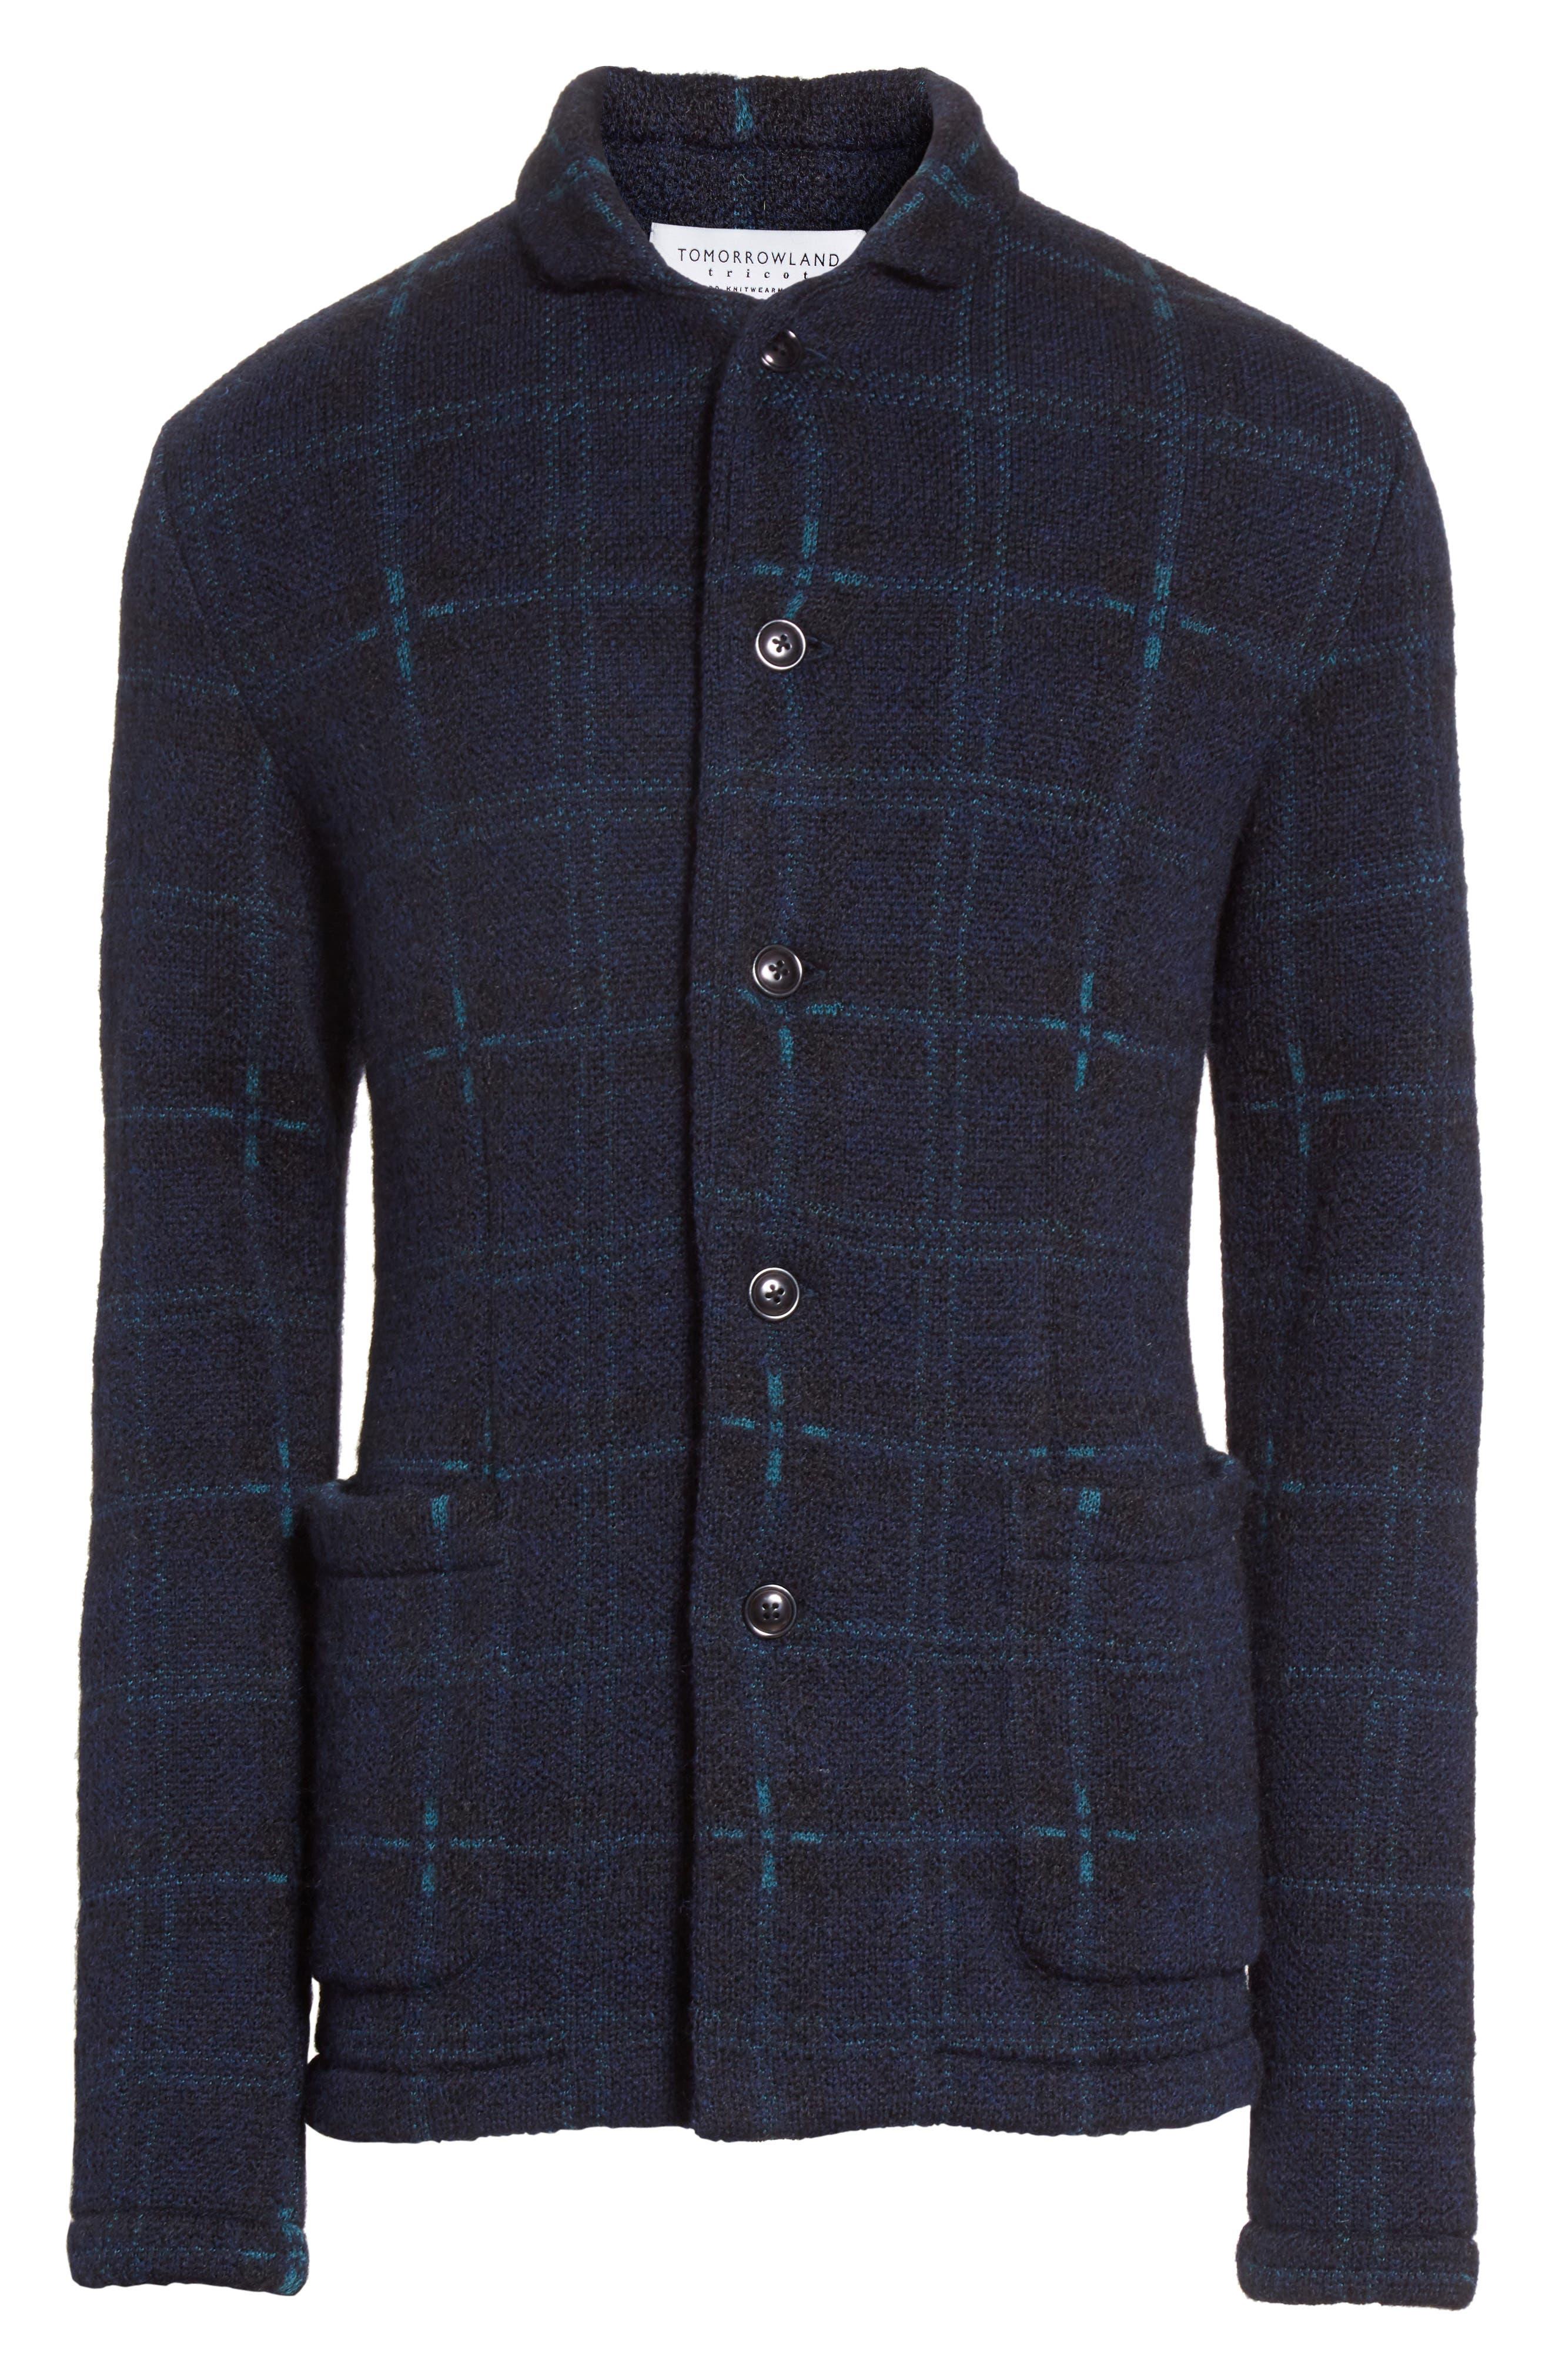 Wool Blend Knit Sportcoat,                             Alternate thumbnail 6, color,                             Navy